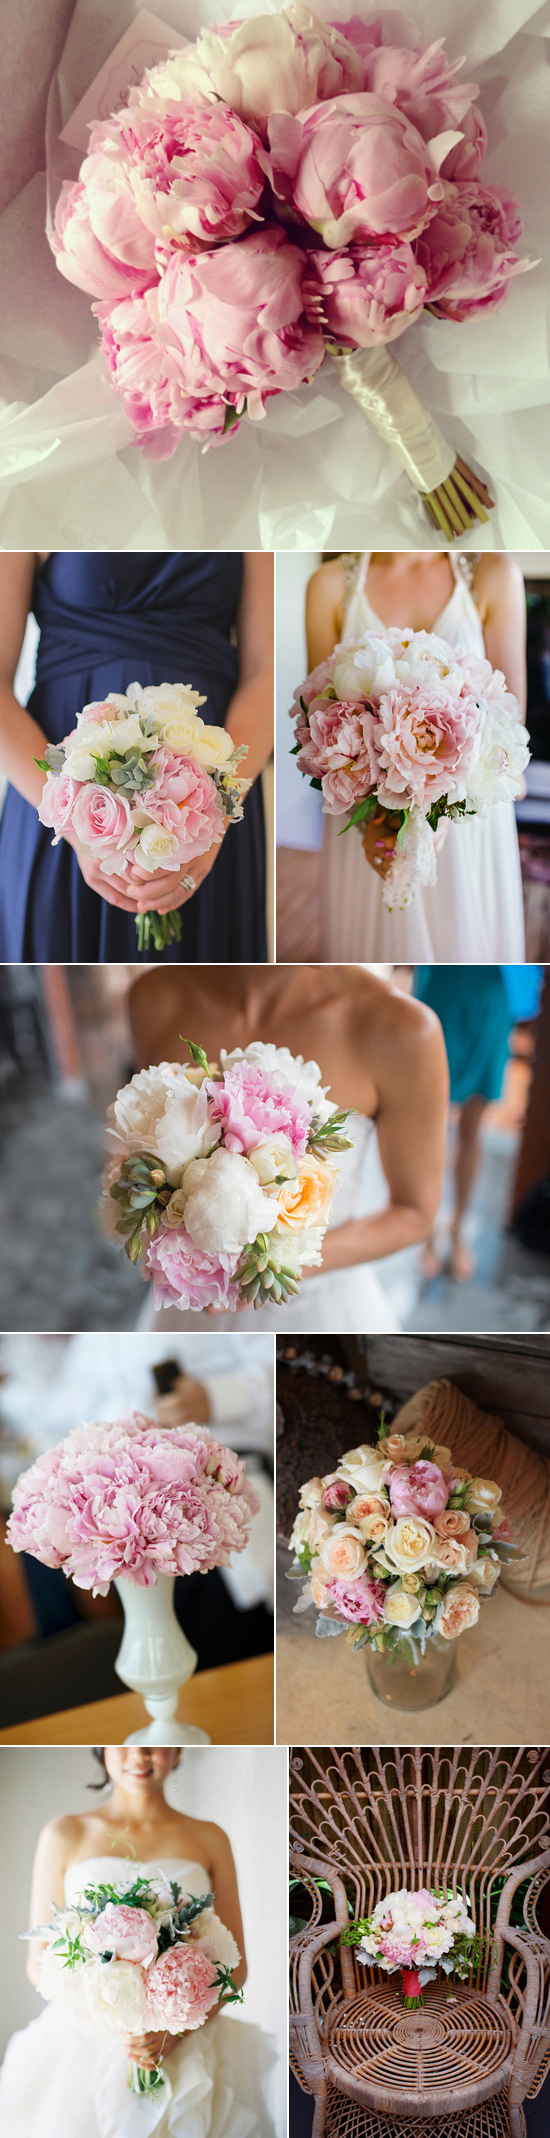 pink peonies wedding inspiration